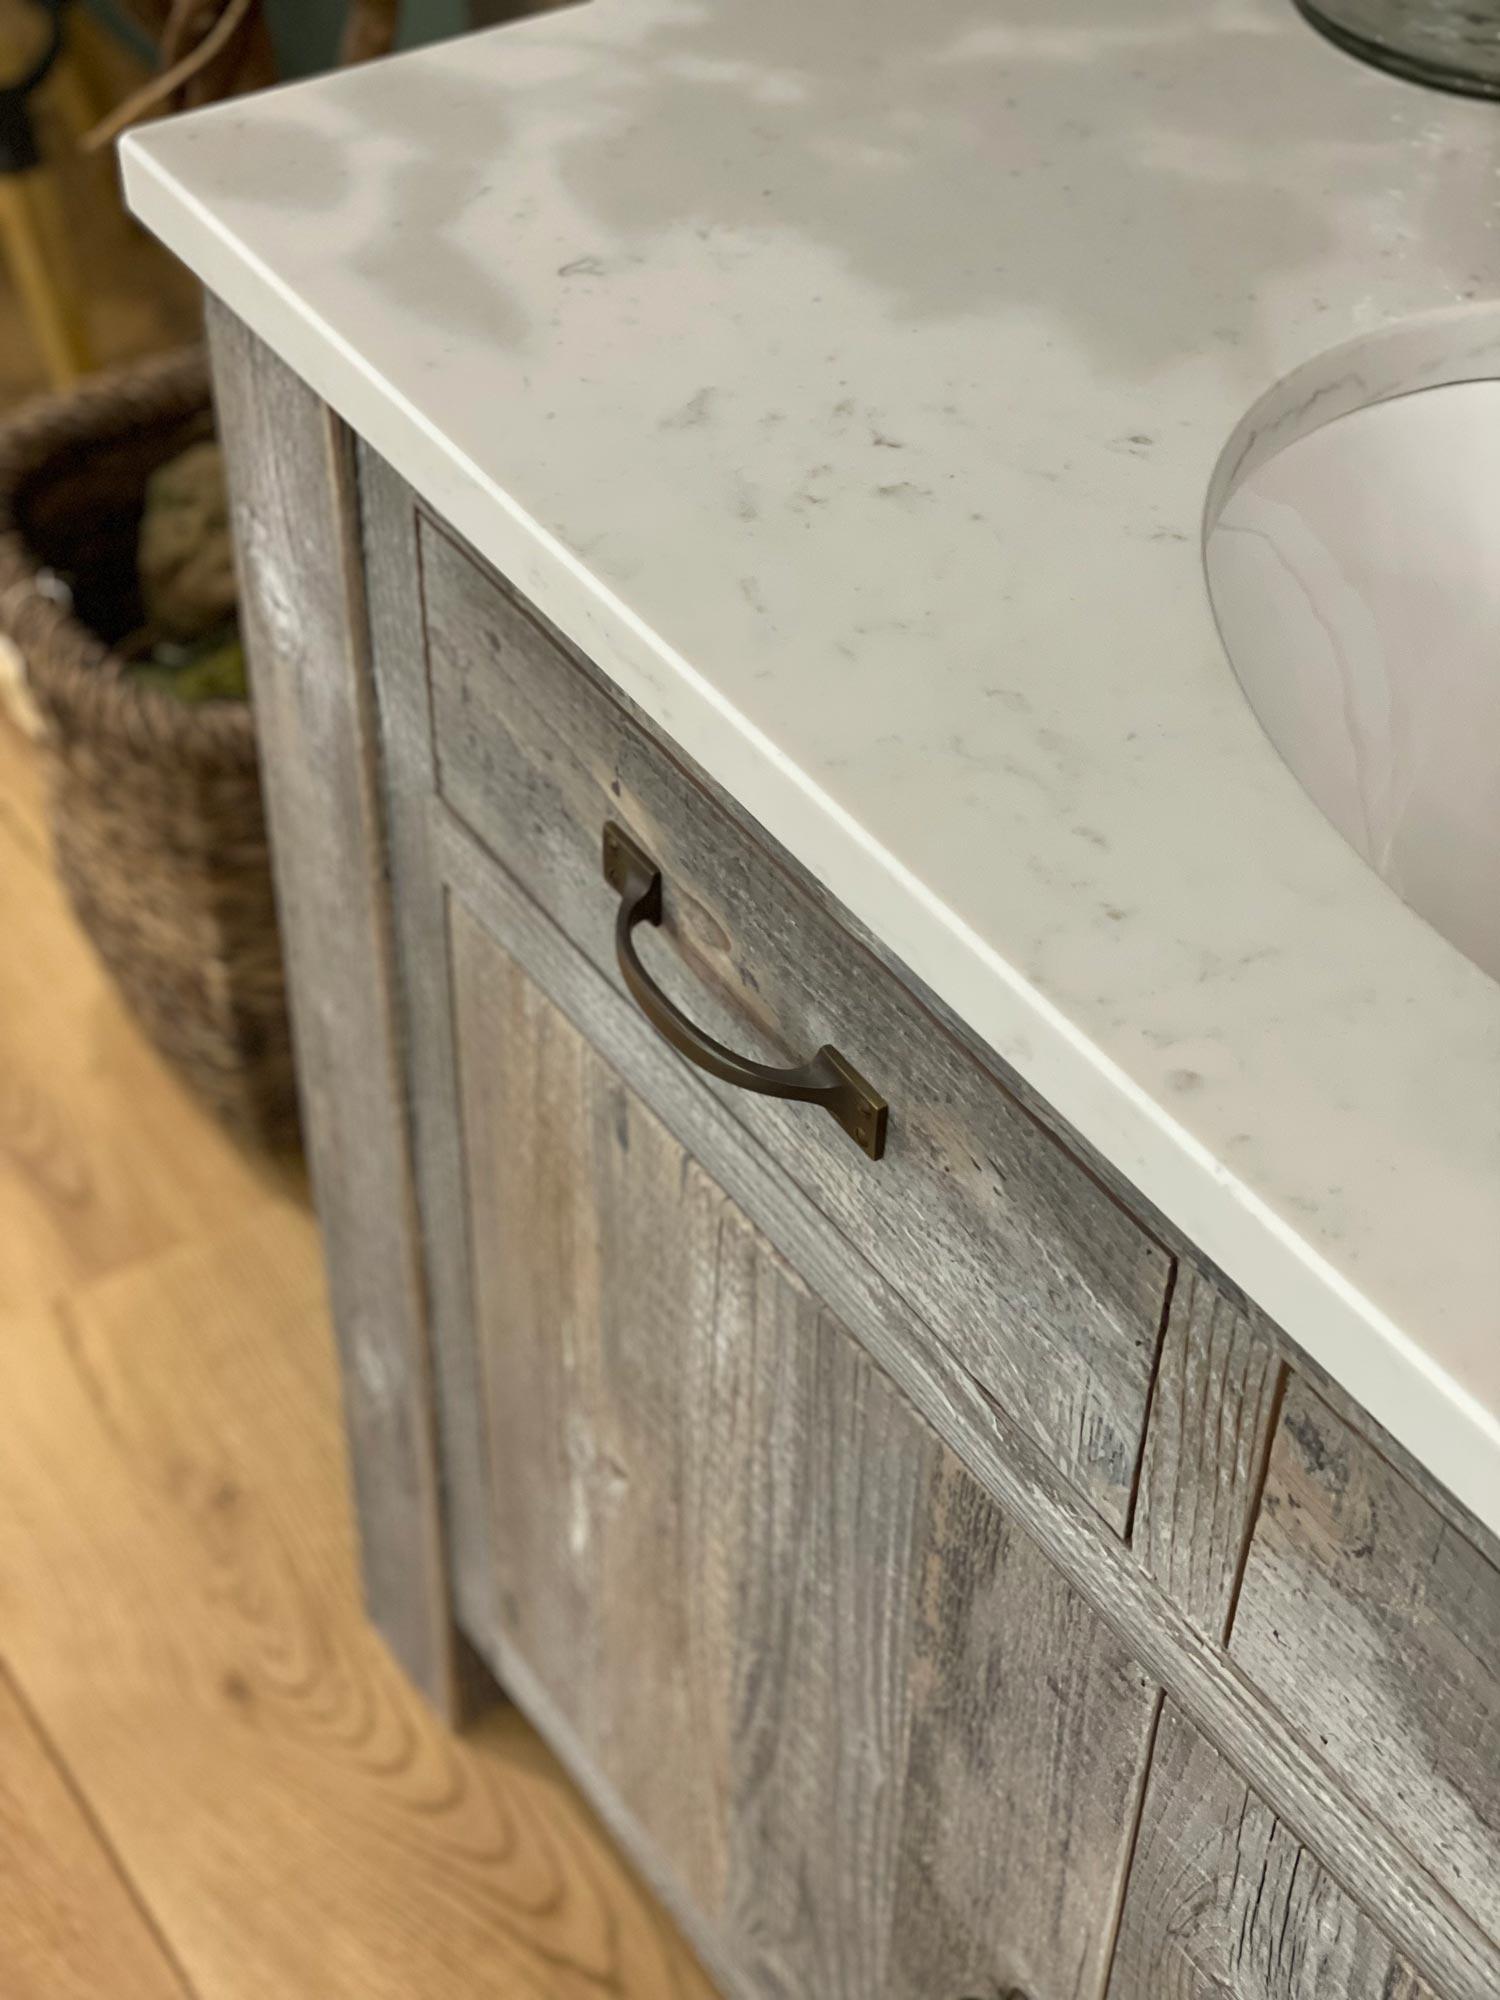 Pull handles on rustic vanity unit